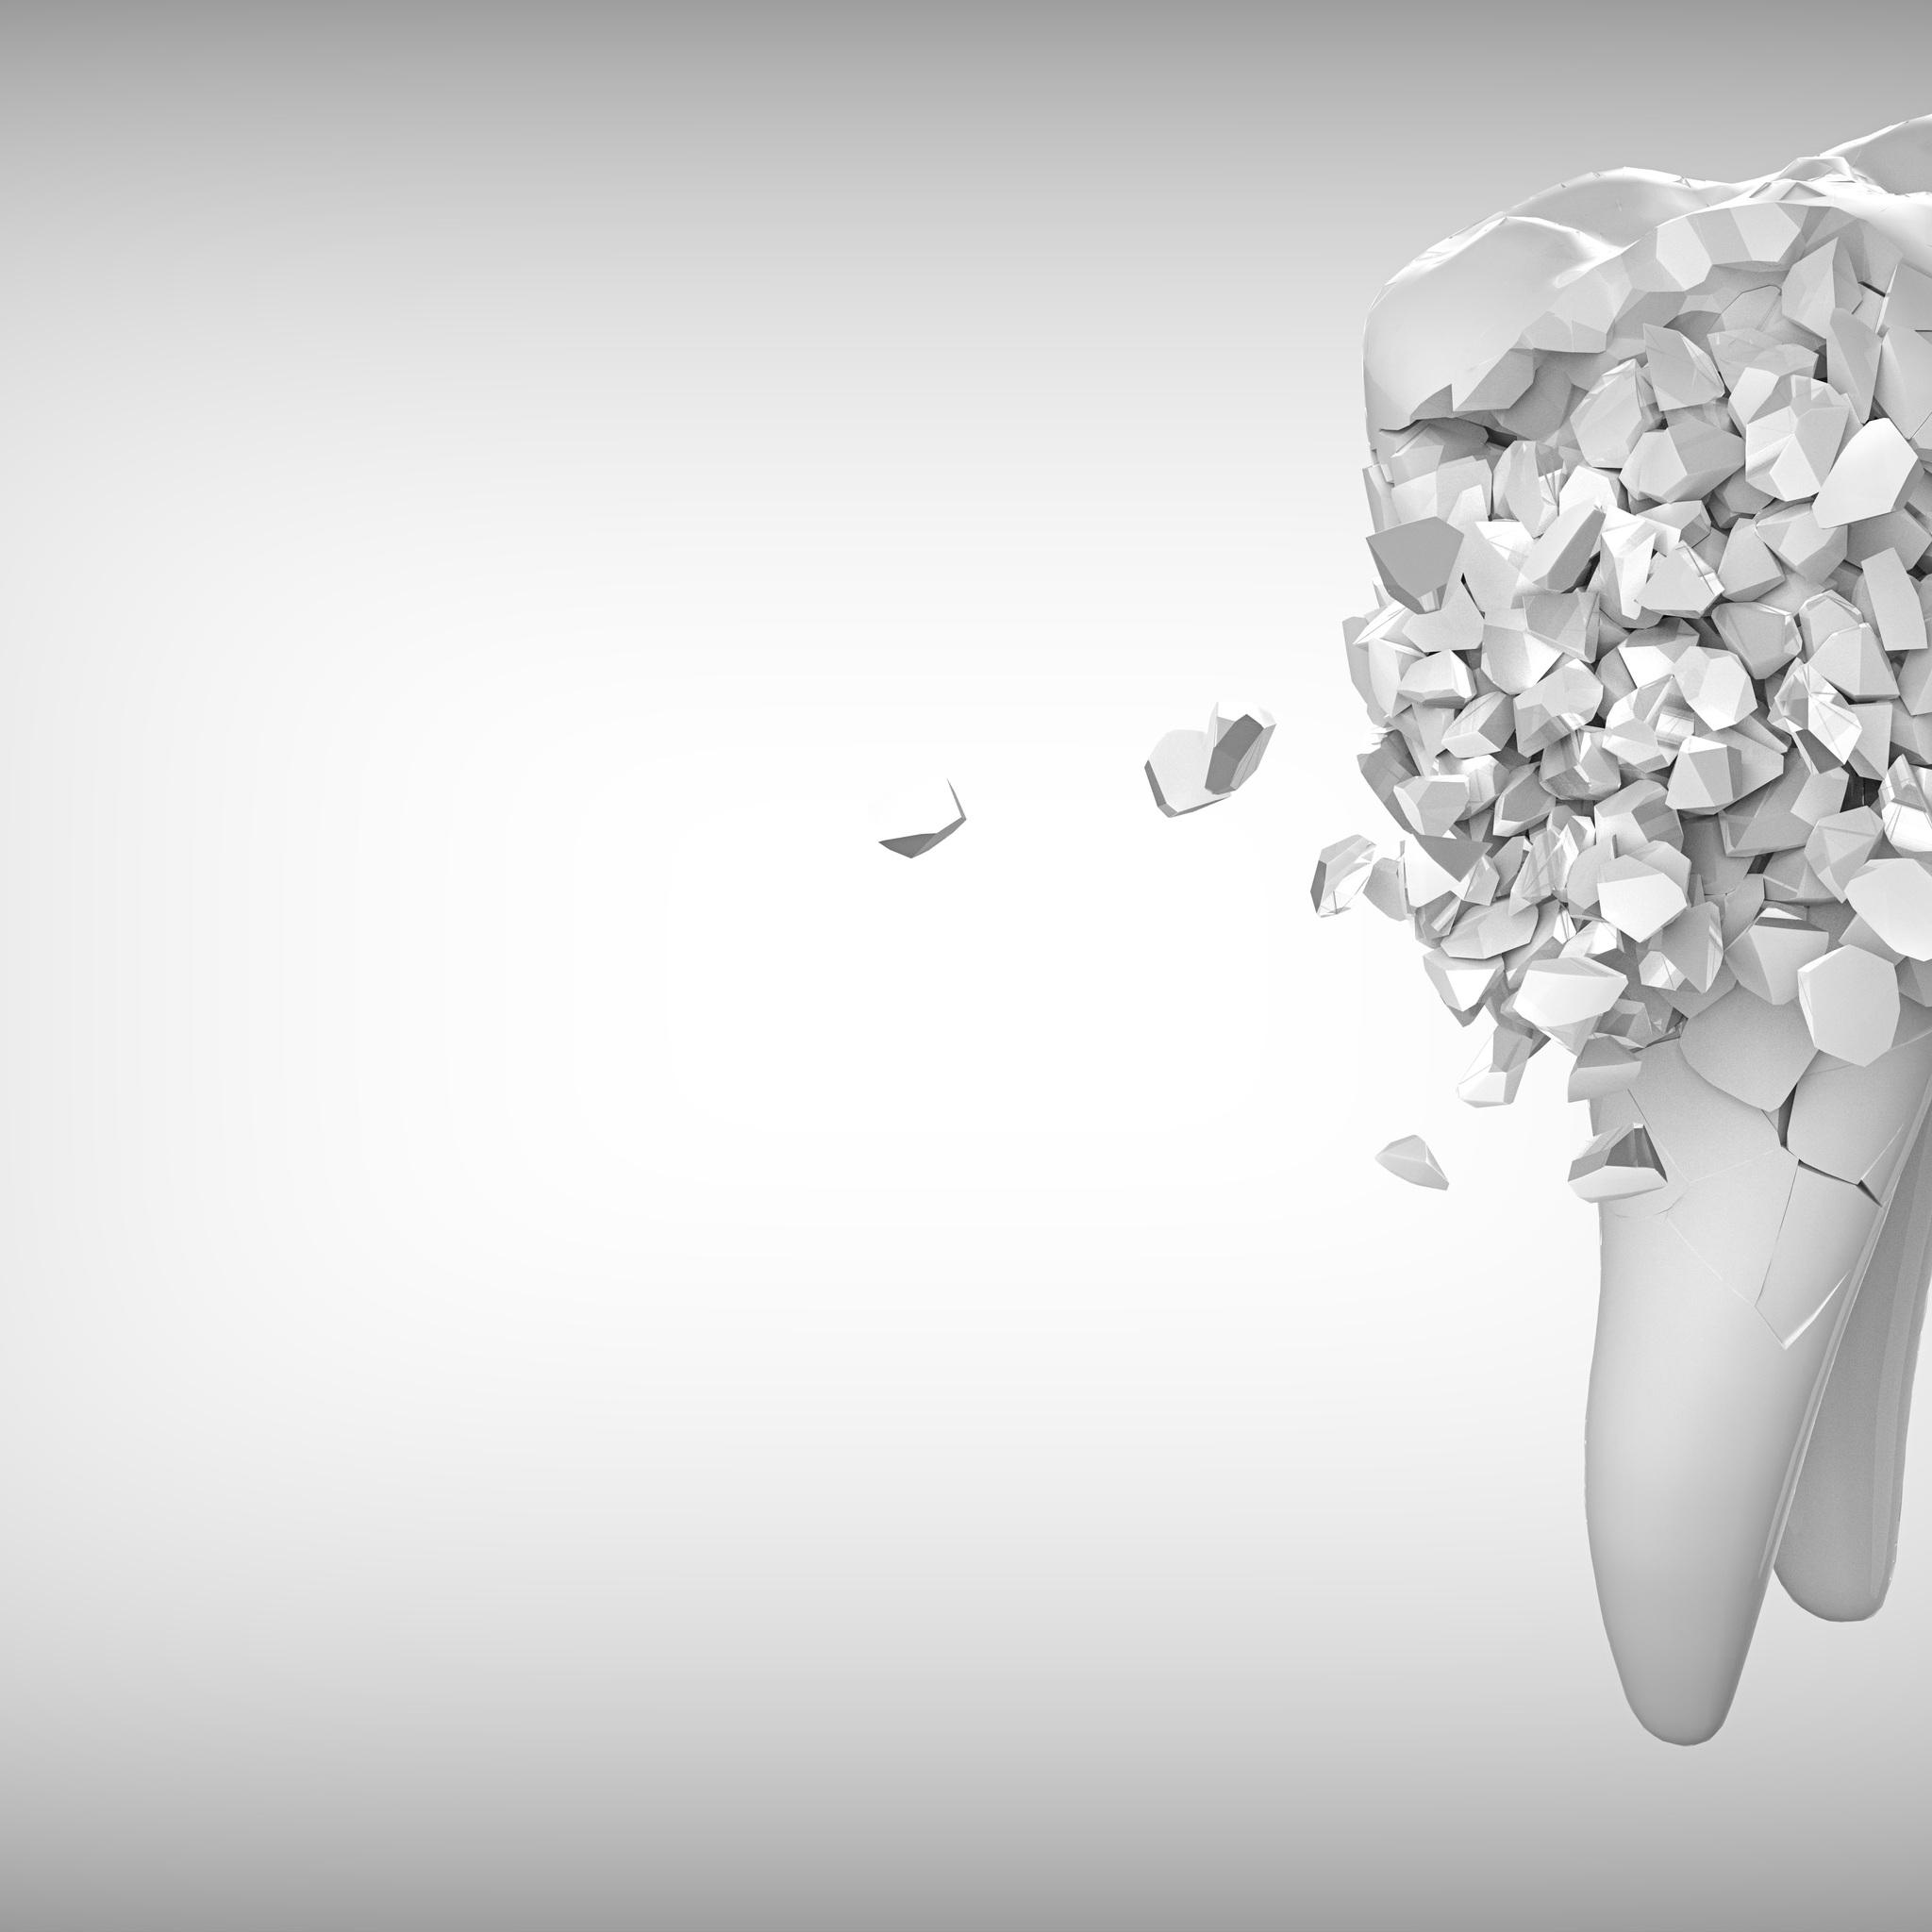 2048x2048 Tooth Creative Art 8k Ipad Air HD 4k Wallpapers